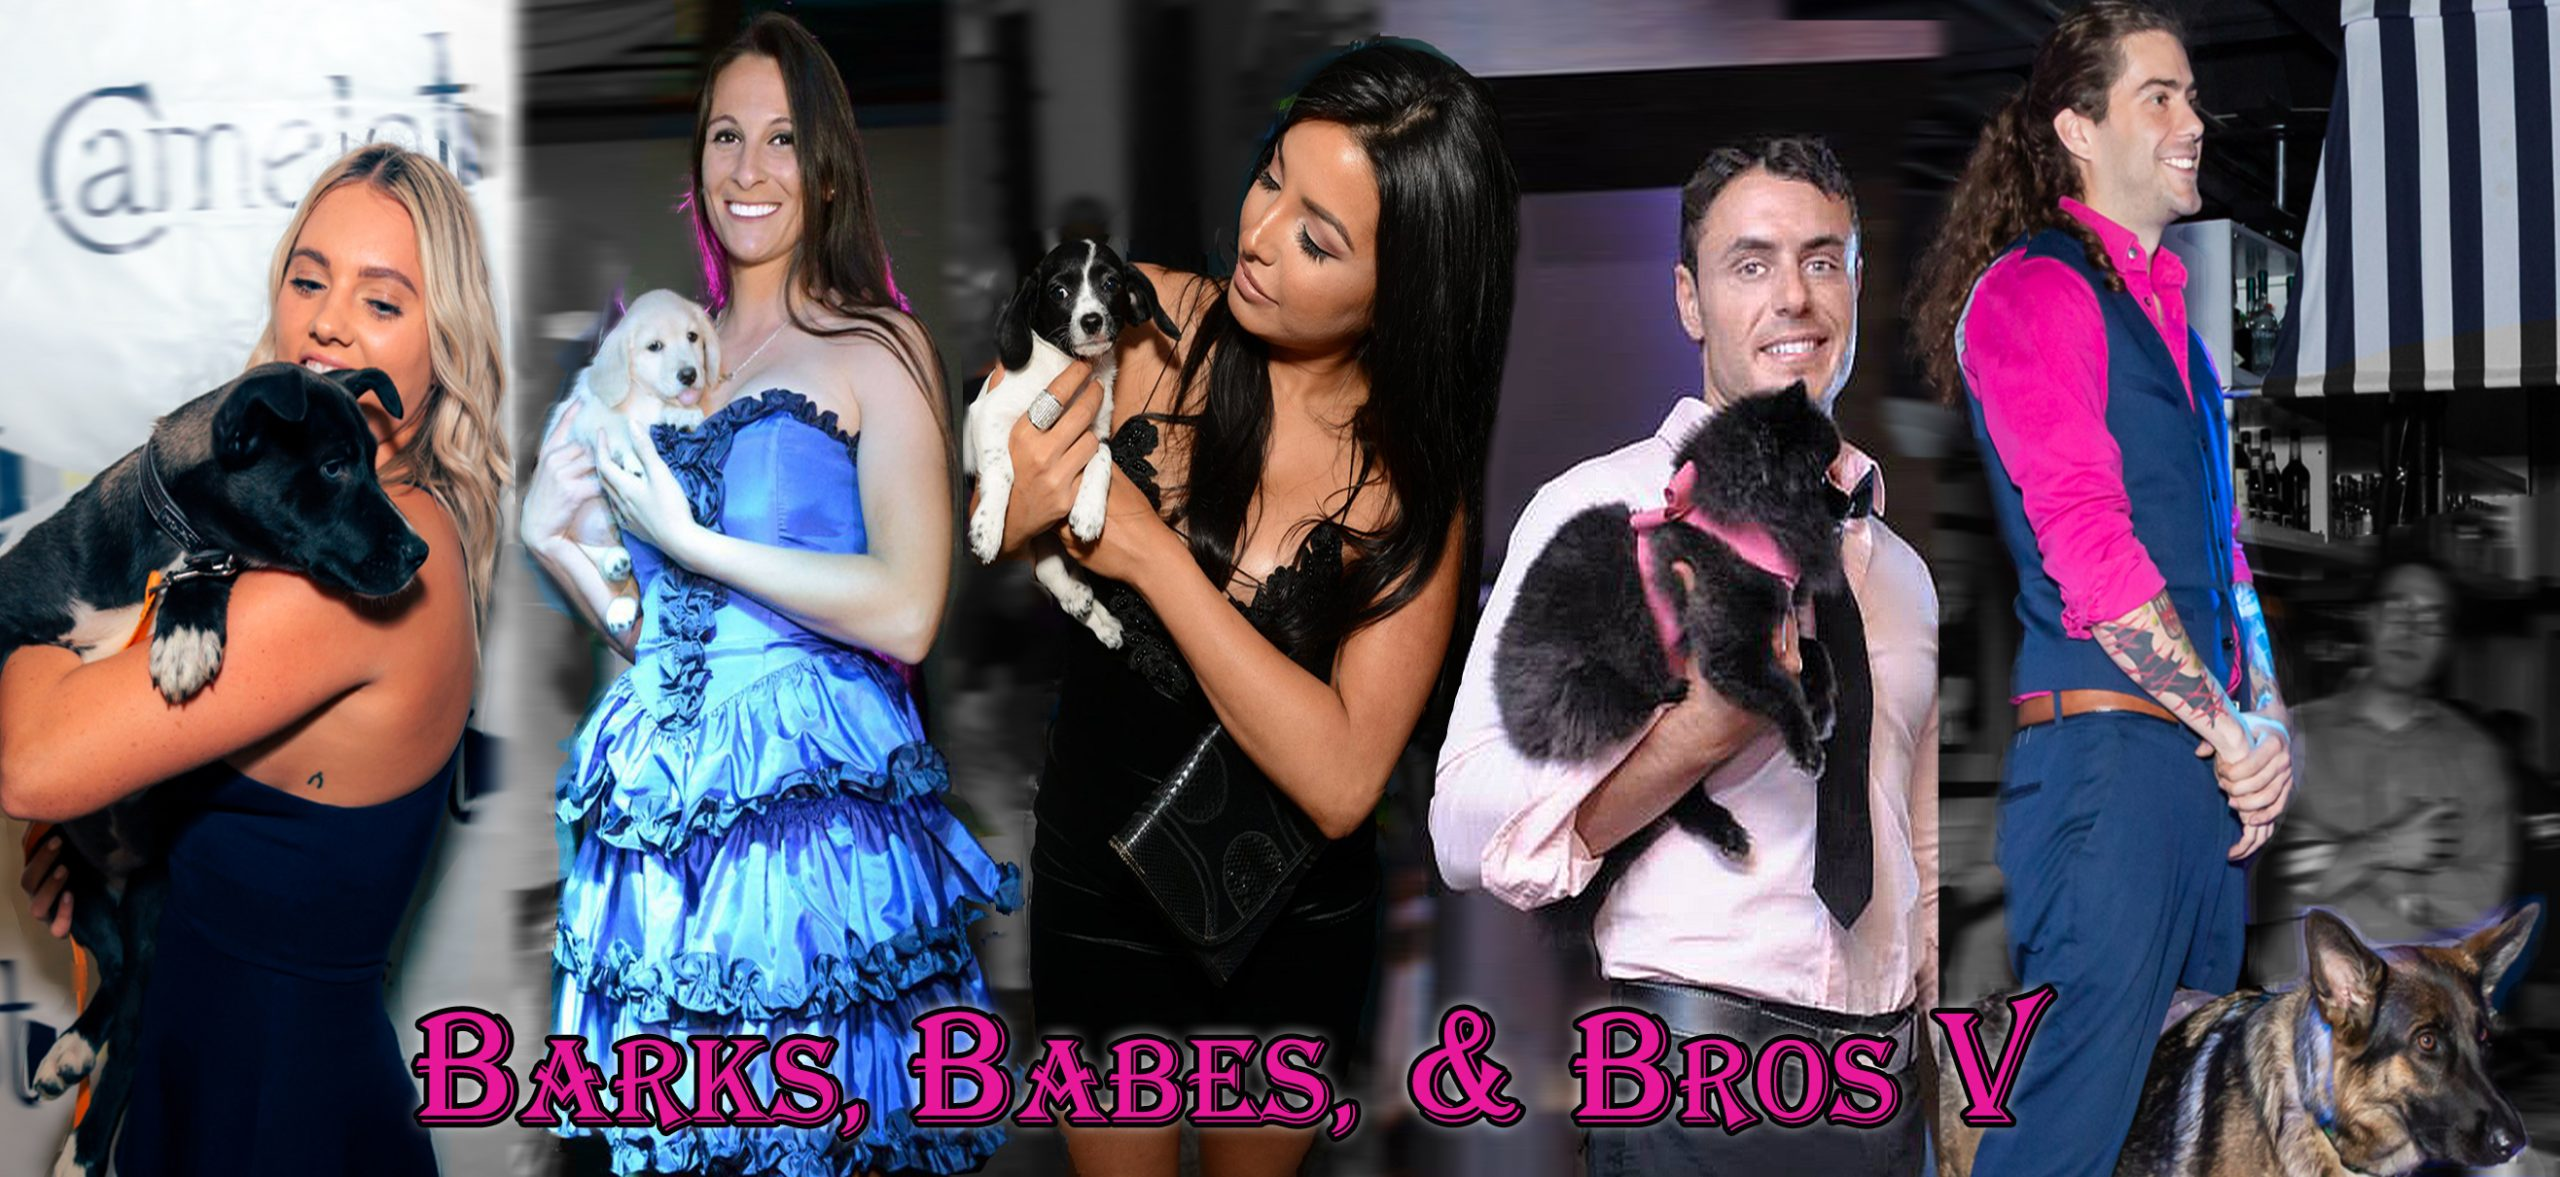 Barks Babes Bros